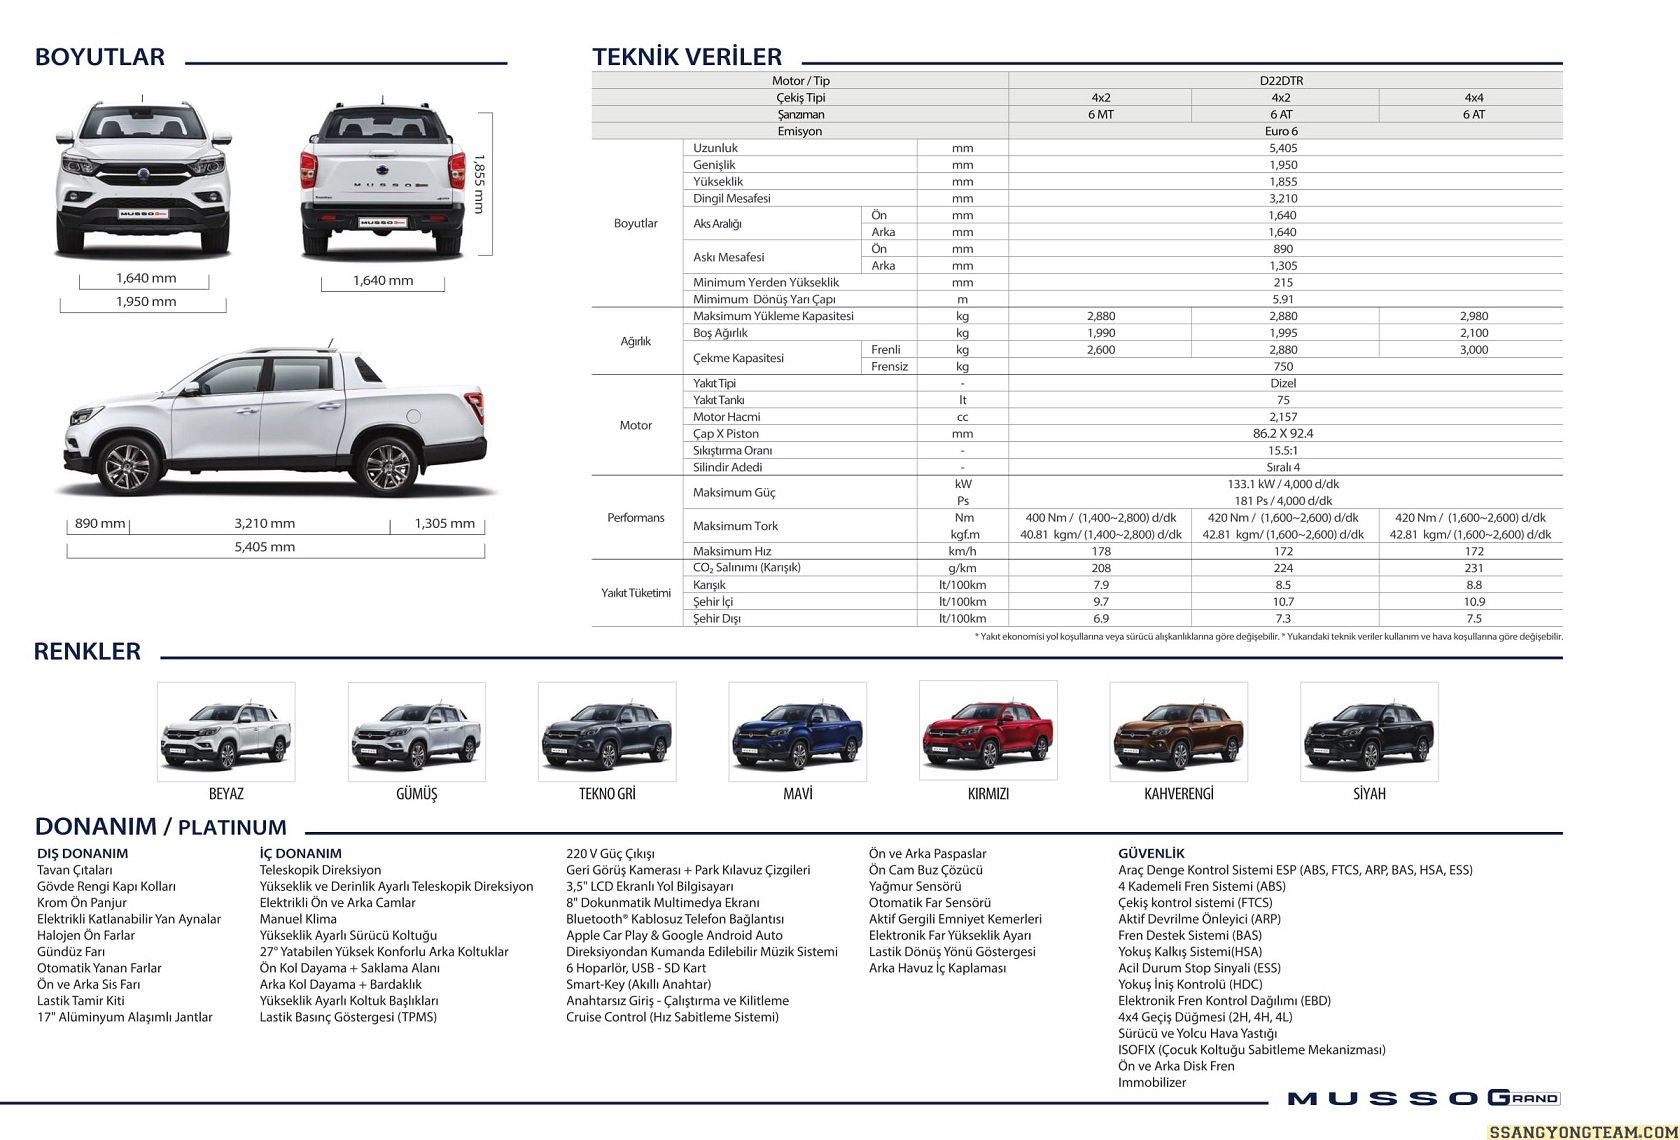 symc genel katalog 2a 5c986f50307c8 - Yeni musso grand